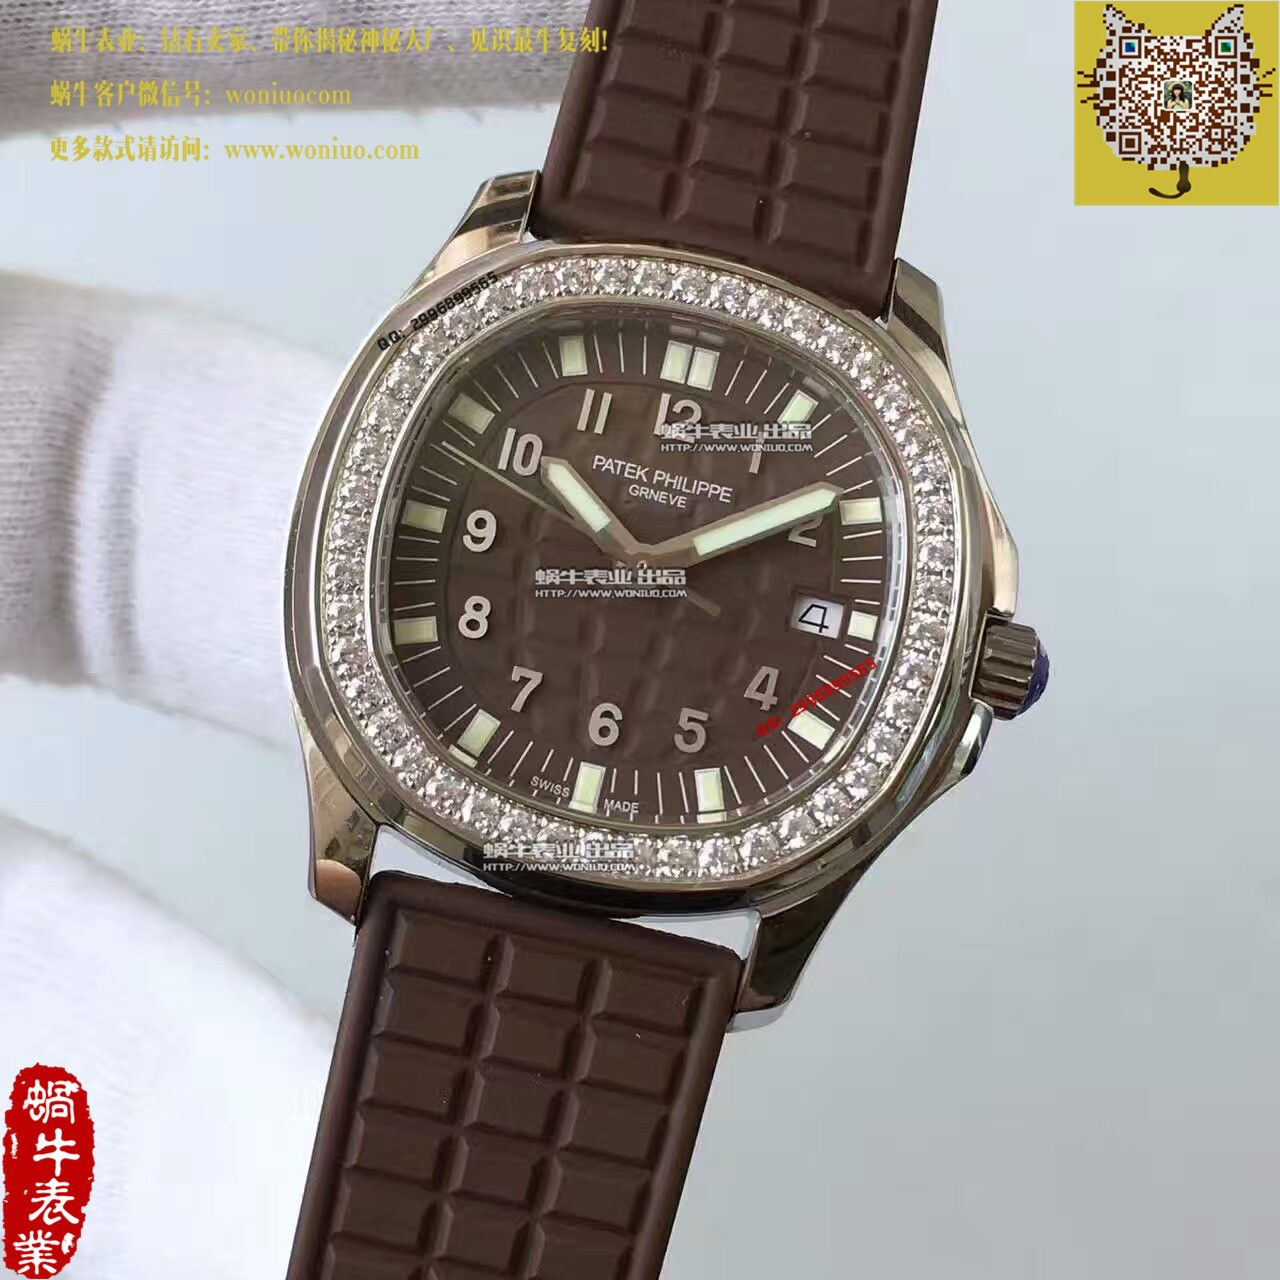 【BP厂1:1高仿手表】百达翡丽AQUANAUT系列5067A-023女士腕表 / BD187